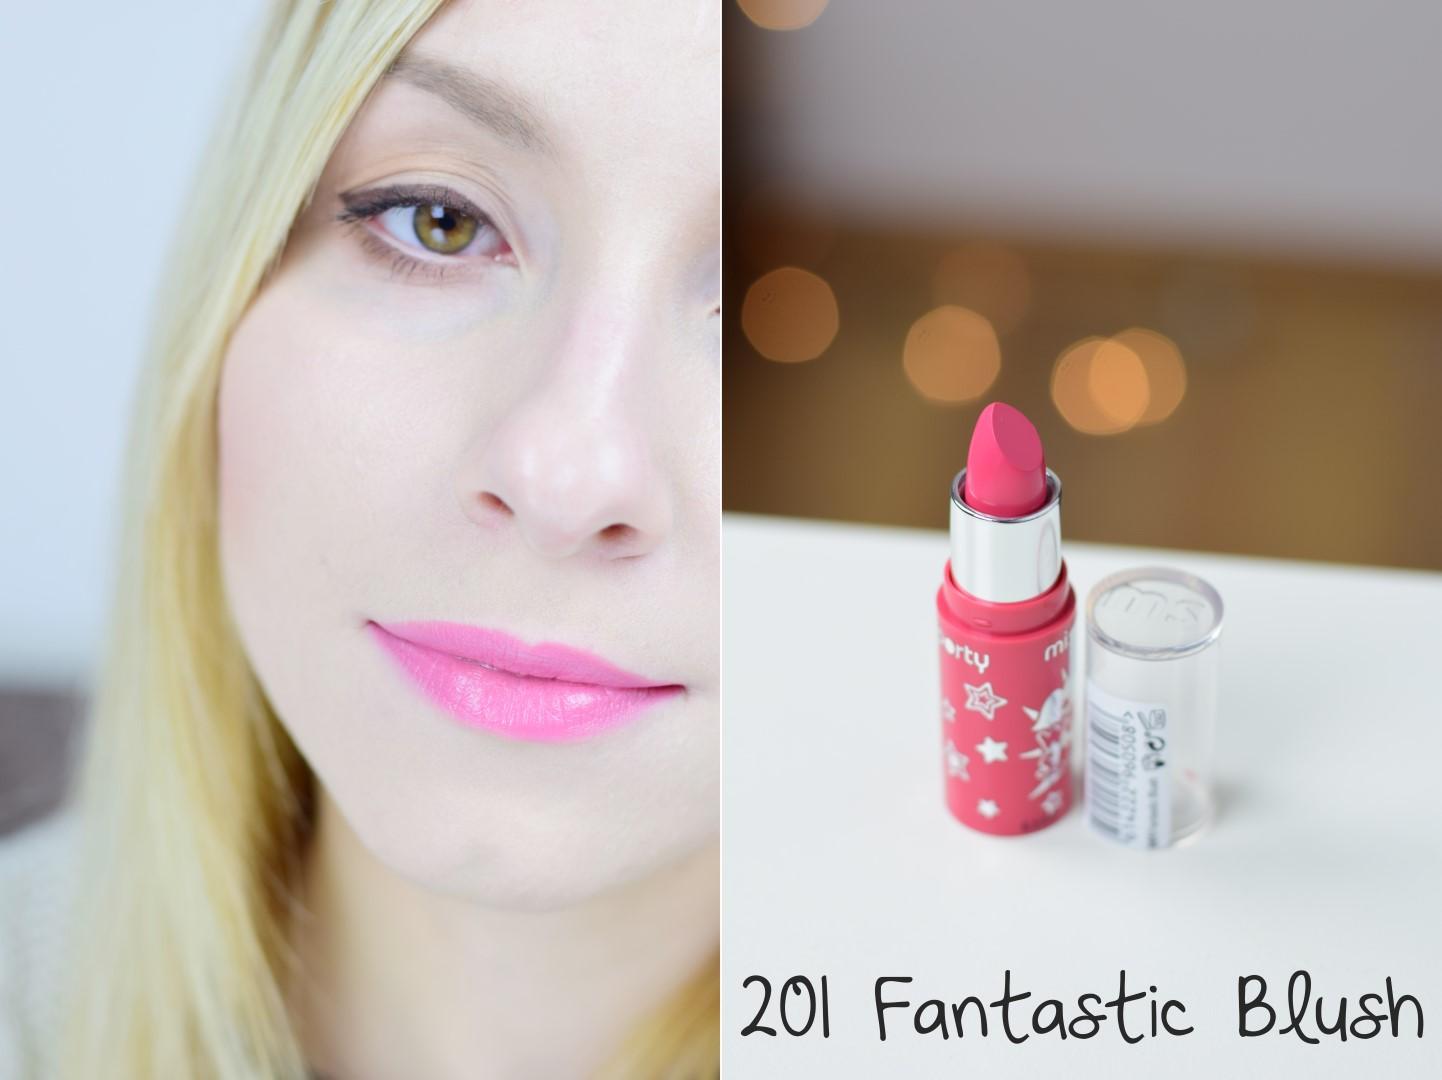 miss_sporty_wonder_smooth_blog_opinia_recenzja_swatche_fantastic_blush_201